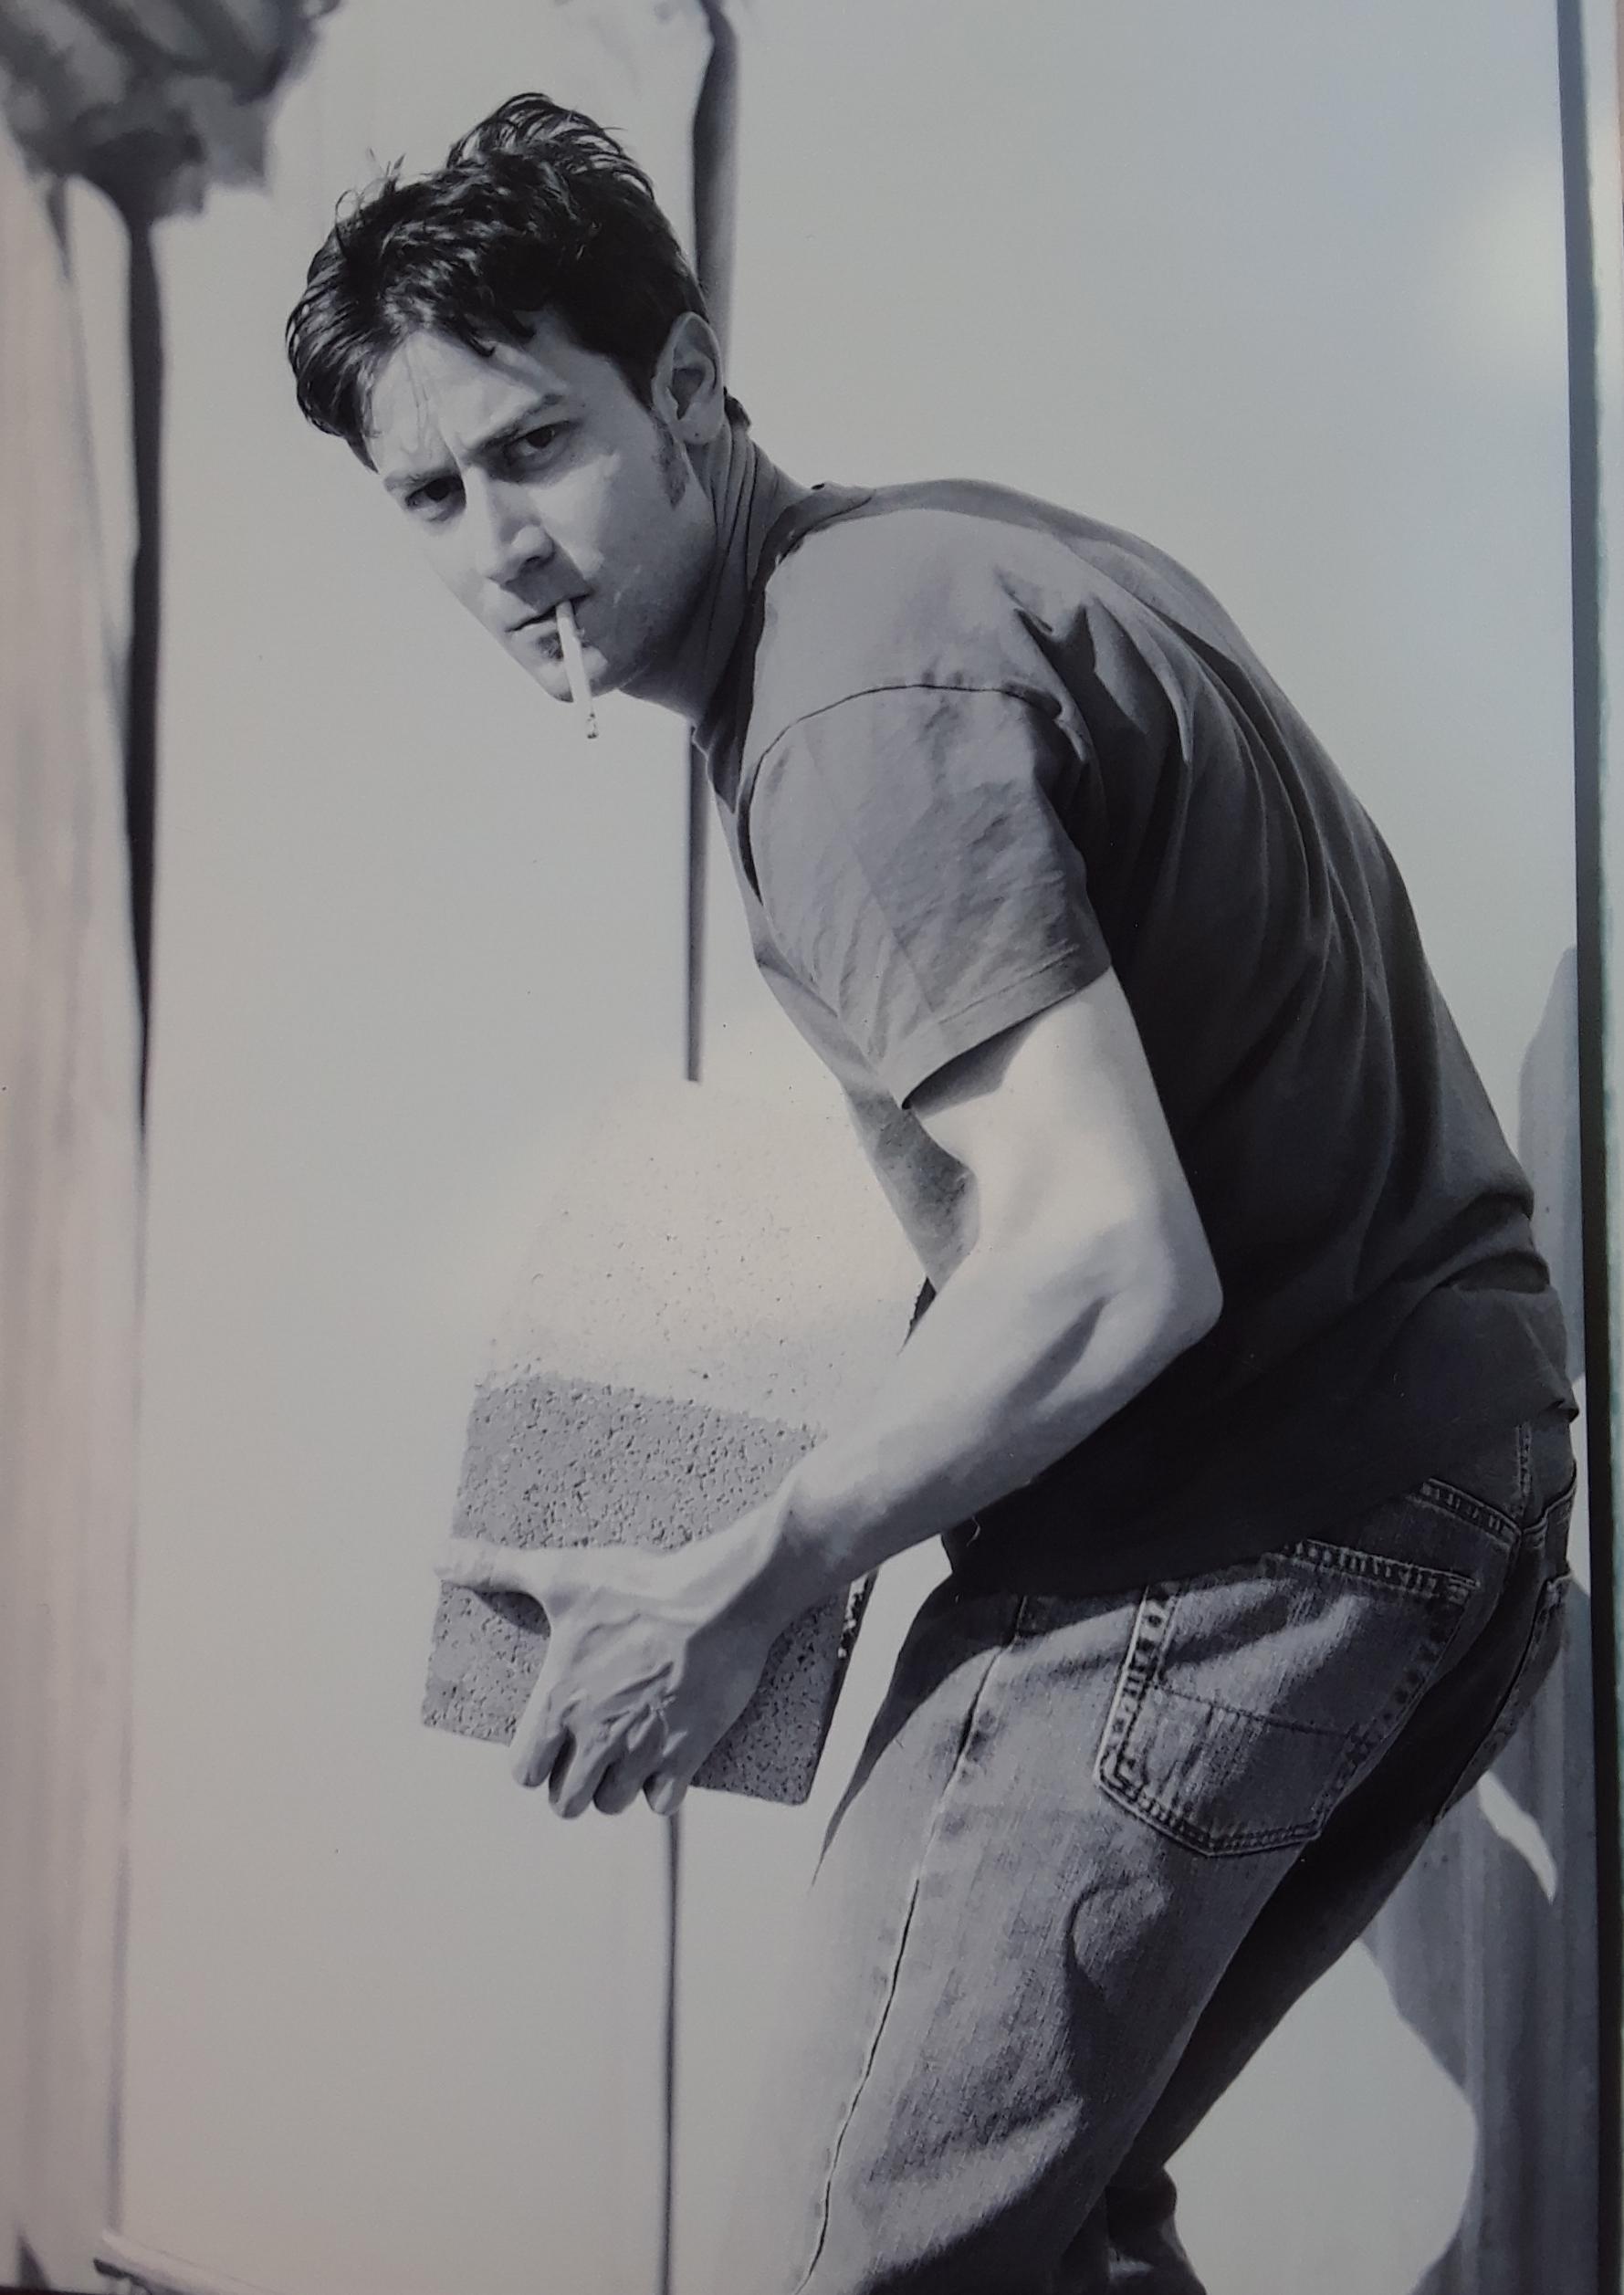 Goofin' around on a photo shoot, Hollywood, 2005